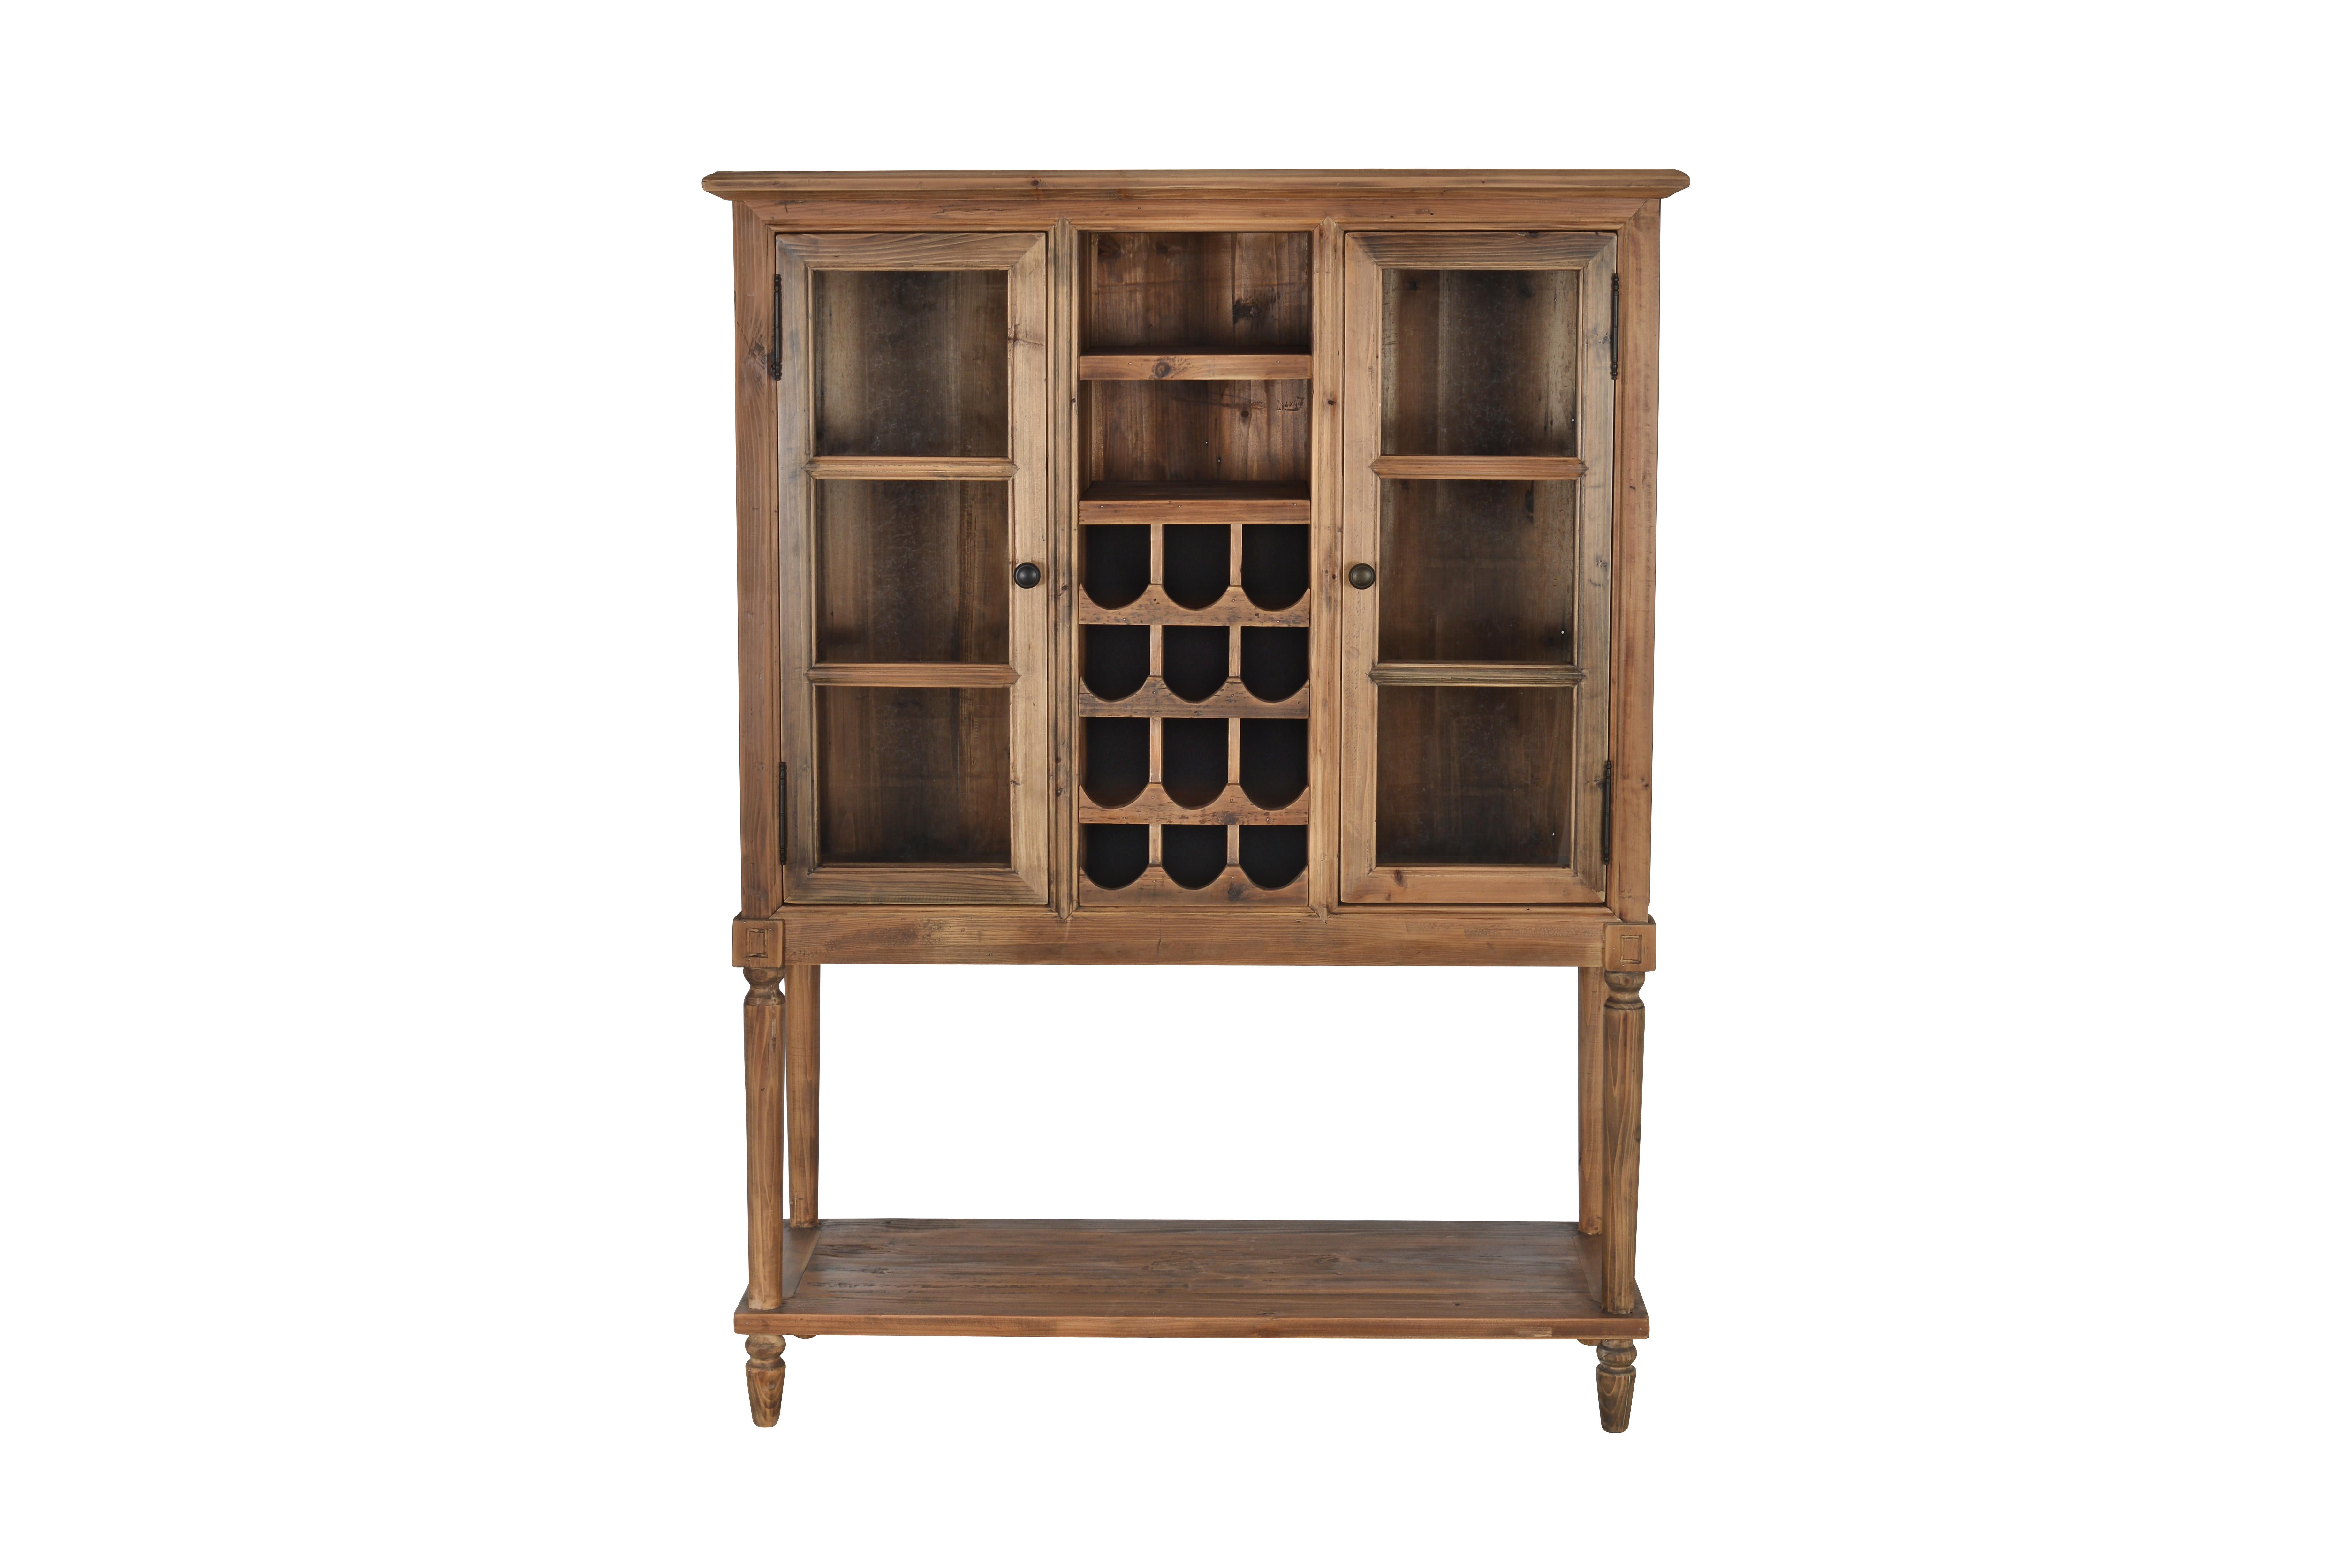 Saloon 49 inch wide birch wood bar cabinet